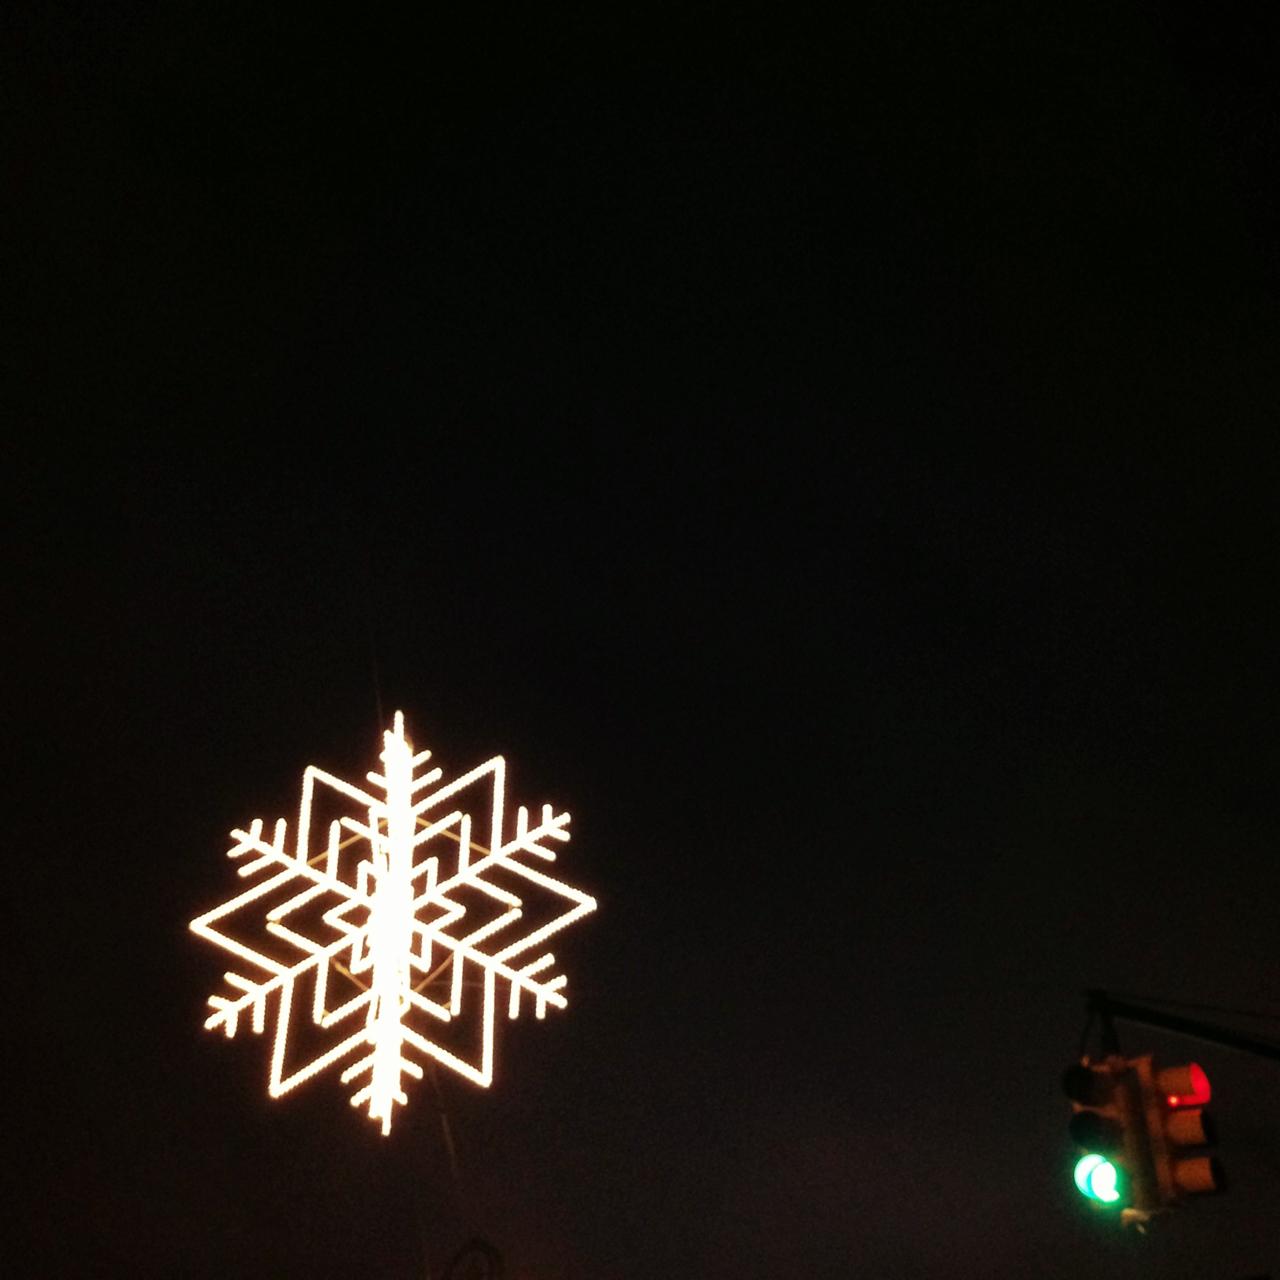 Happy Holidays from Brooklyn!